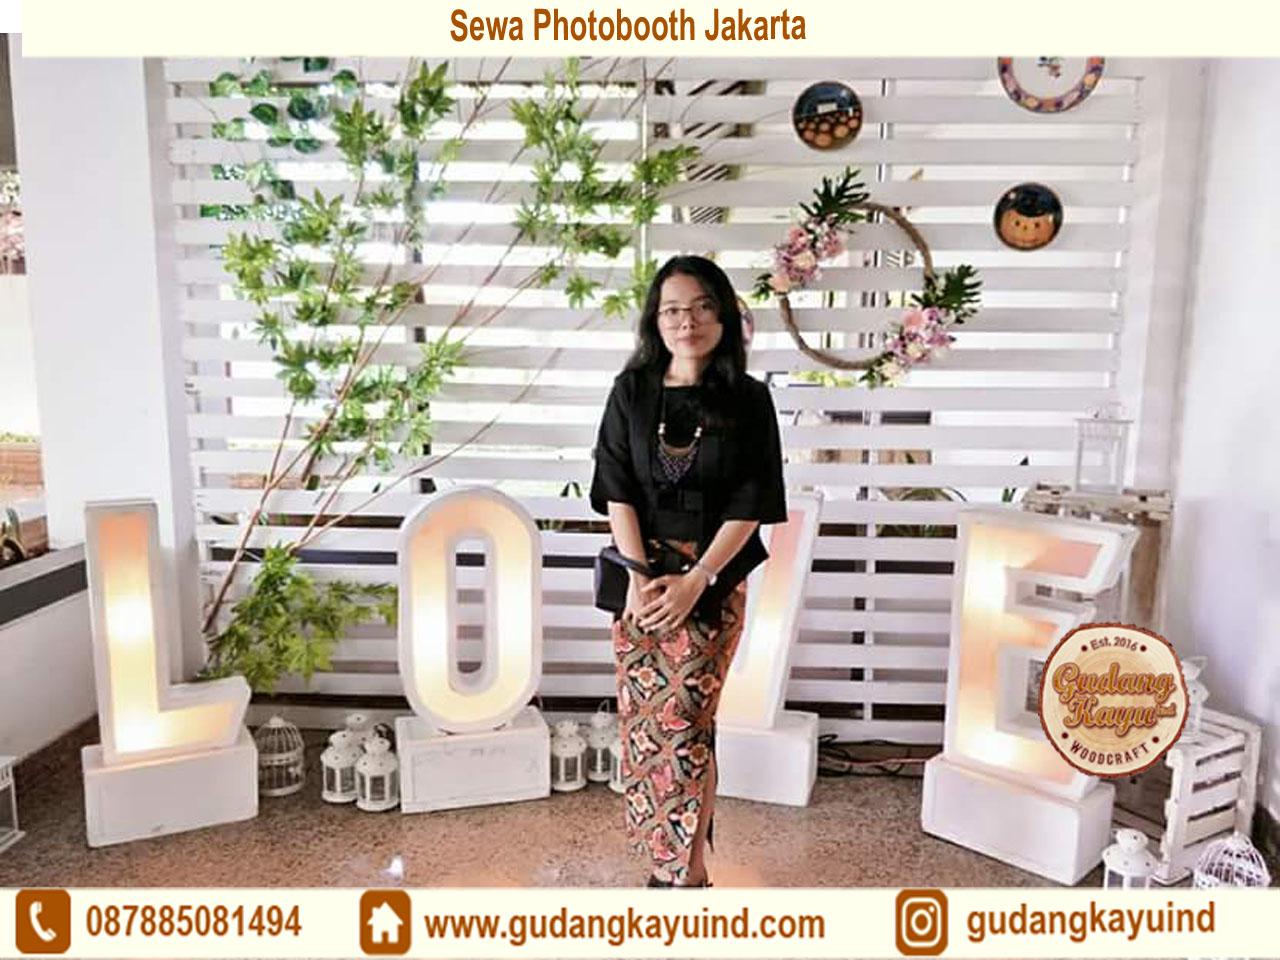 Buat Dekorasi Photobooth Jakarta